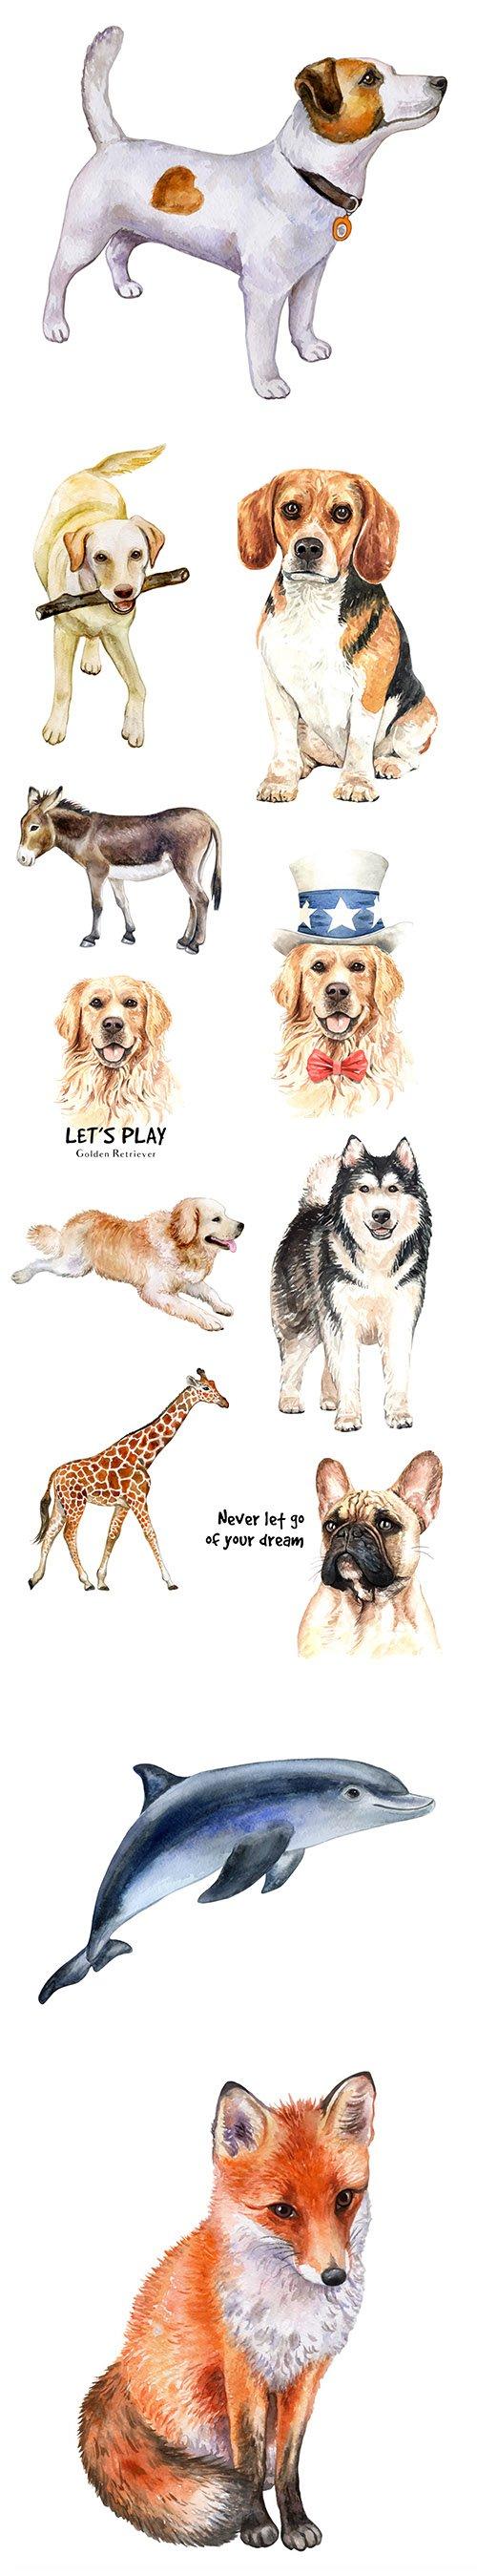 Watercolor Printing Animals Vol 3